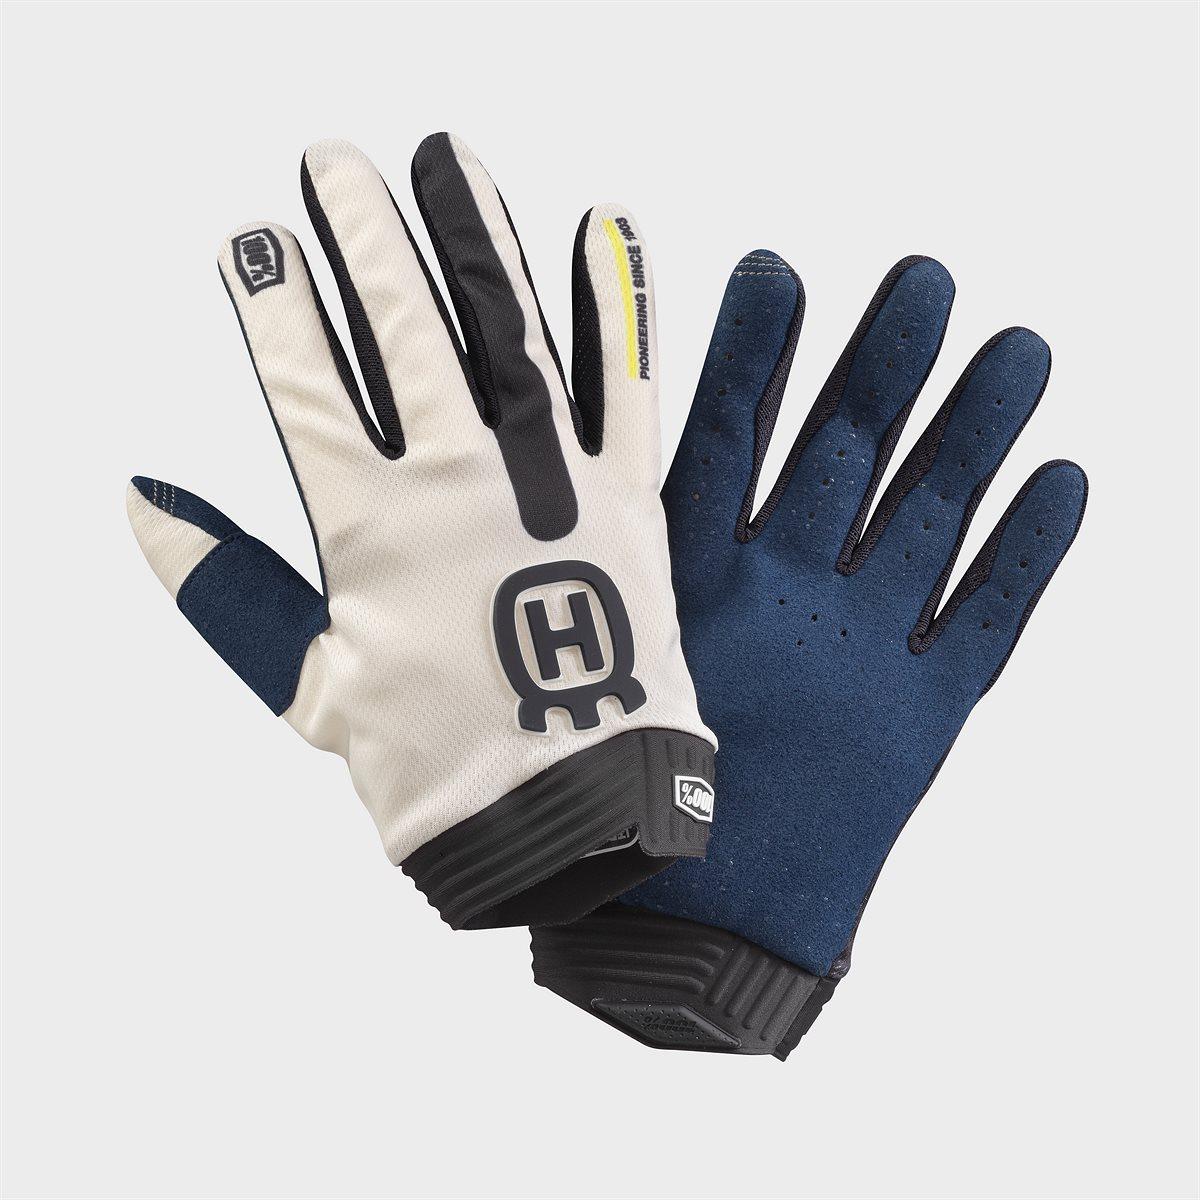 iTrack Origin Gloves (2)